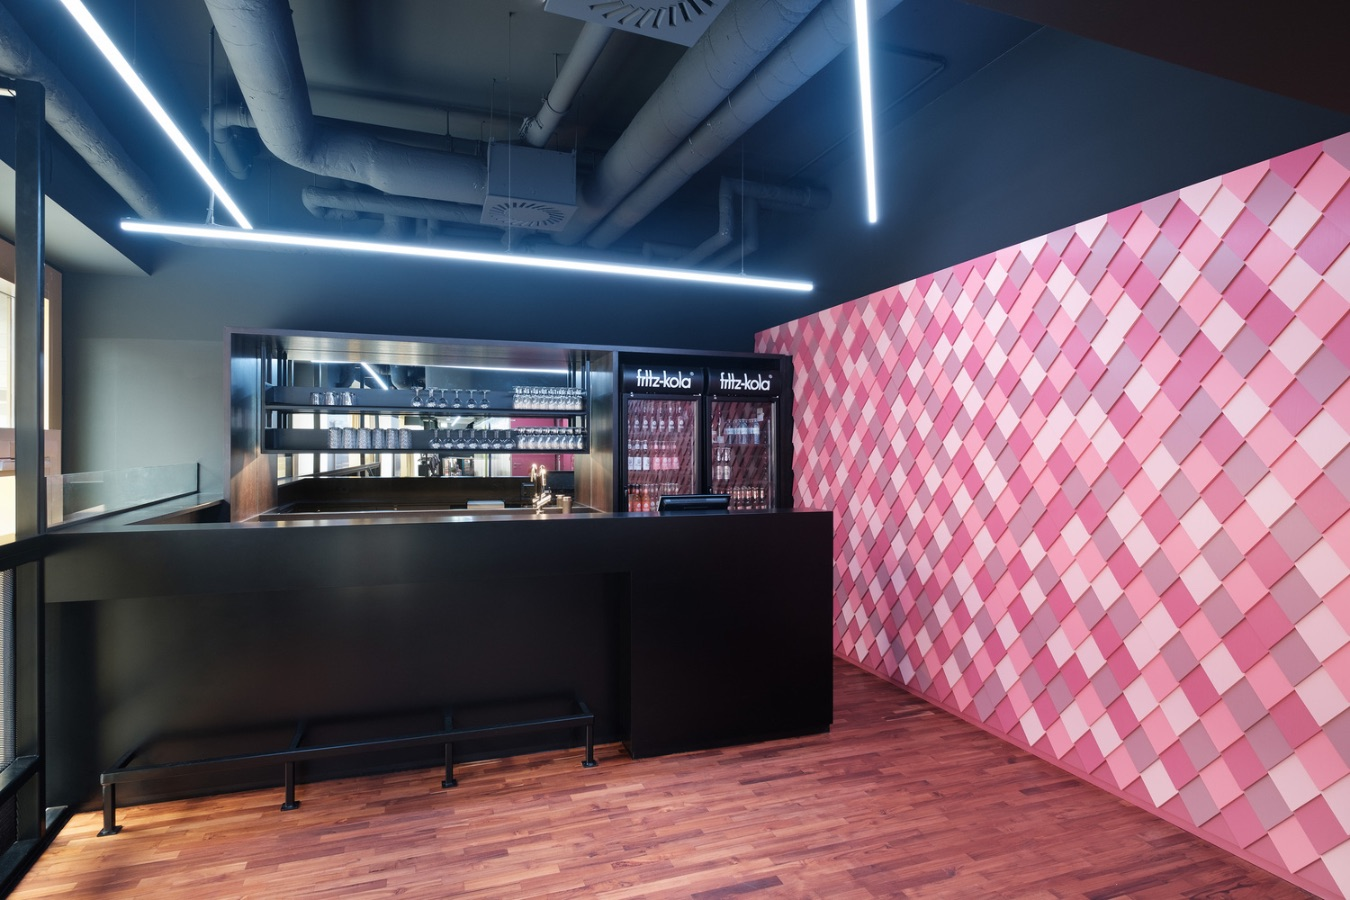 5_Delphi LUX Cinema_Batek Architekten+Ester Bruzkus Architekten_Inspirationist